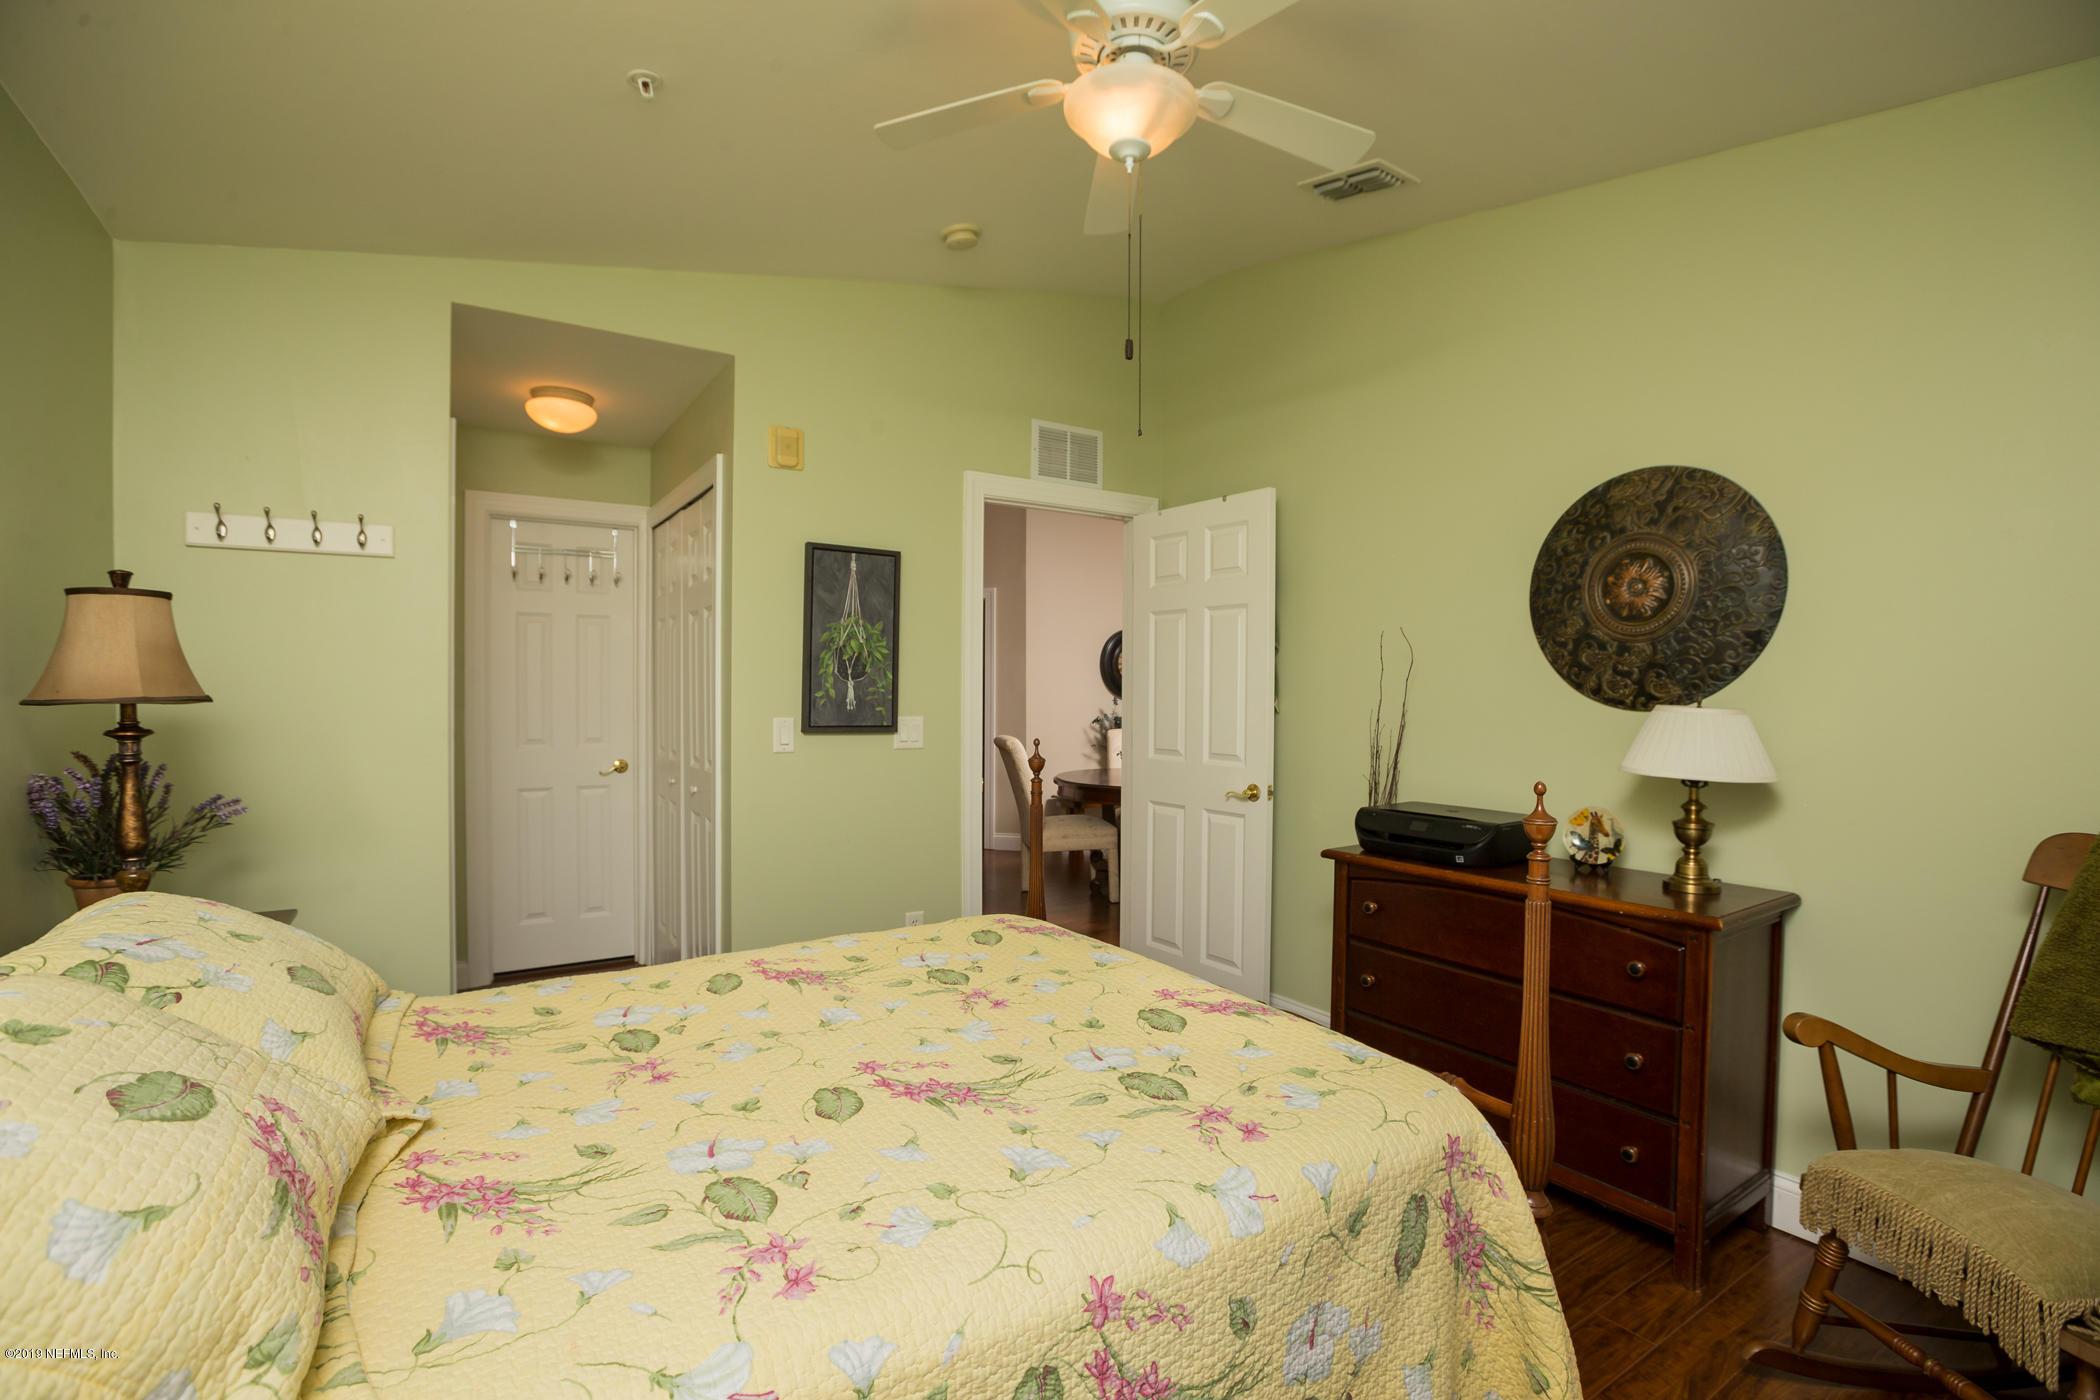 310 RYDER CUP, ST AUGUSTINE, FLORIDA 32092, 2 Bedrooms Bedrooms, ,2 BathroomsBathrooms,Condo,For sale,RYDER CUP,1017486